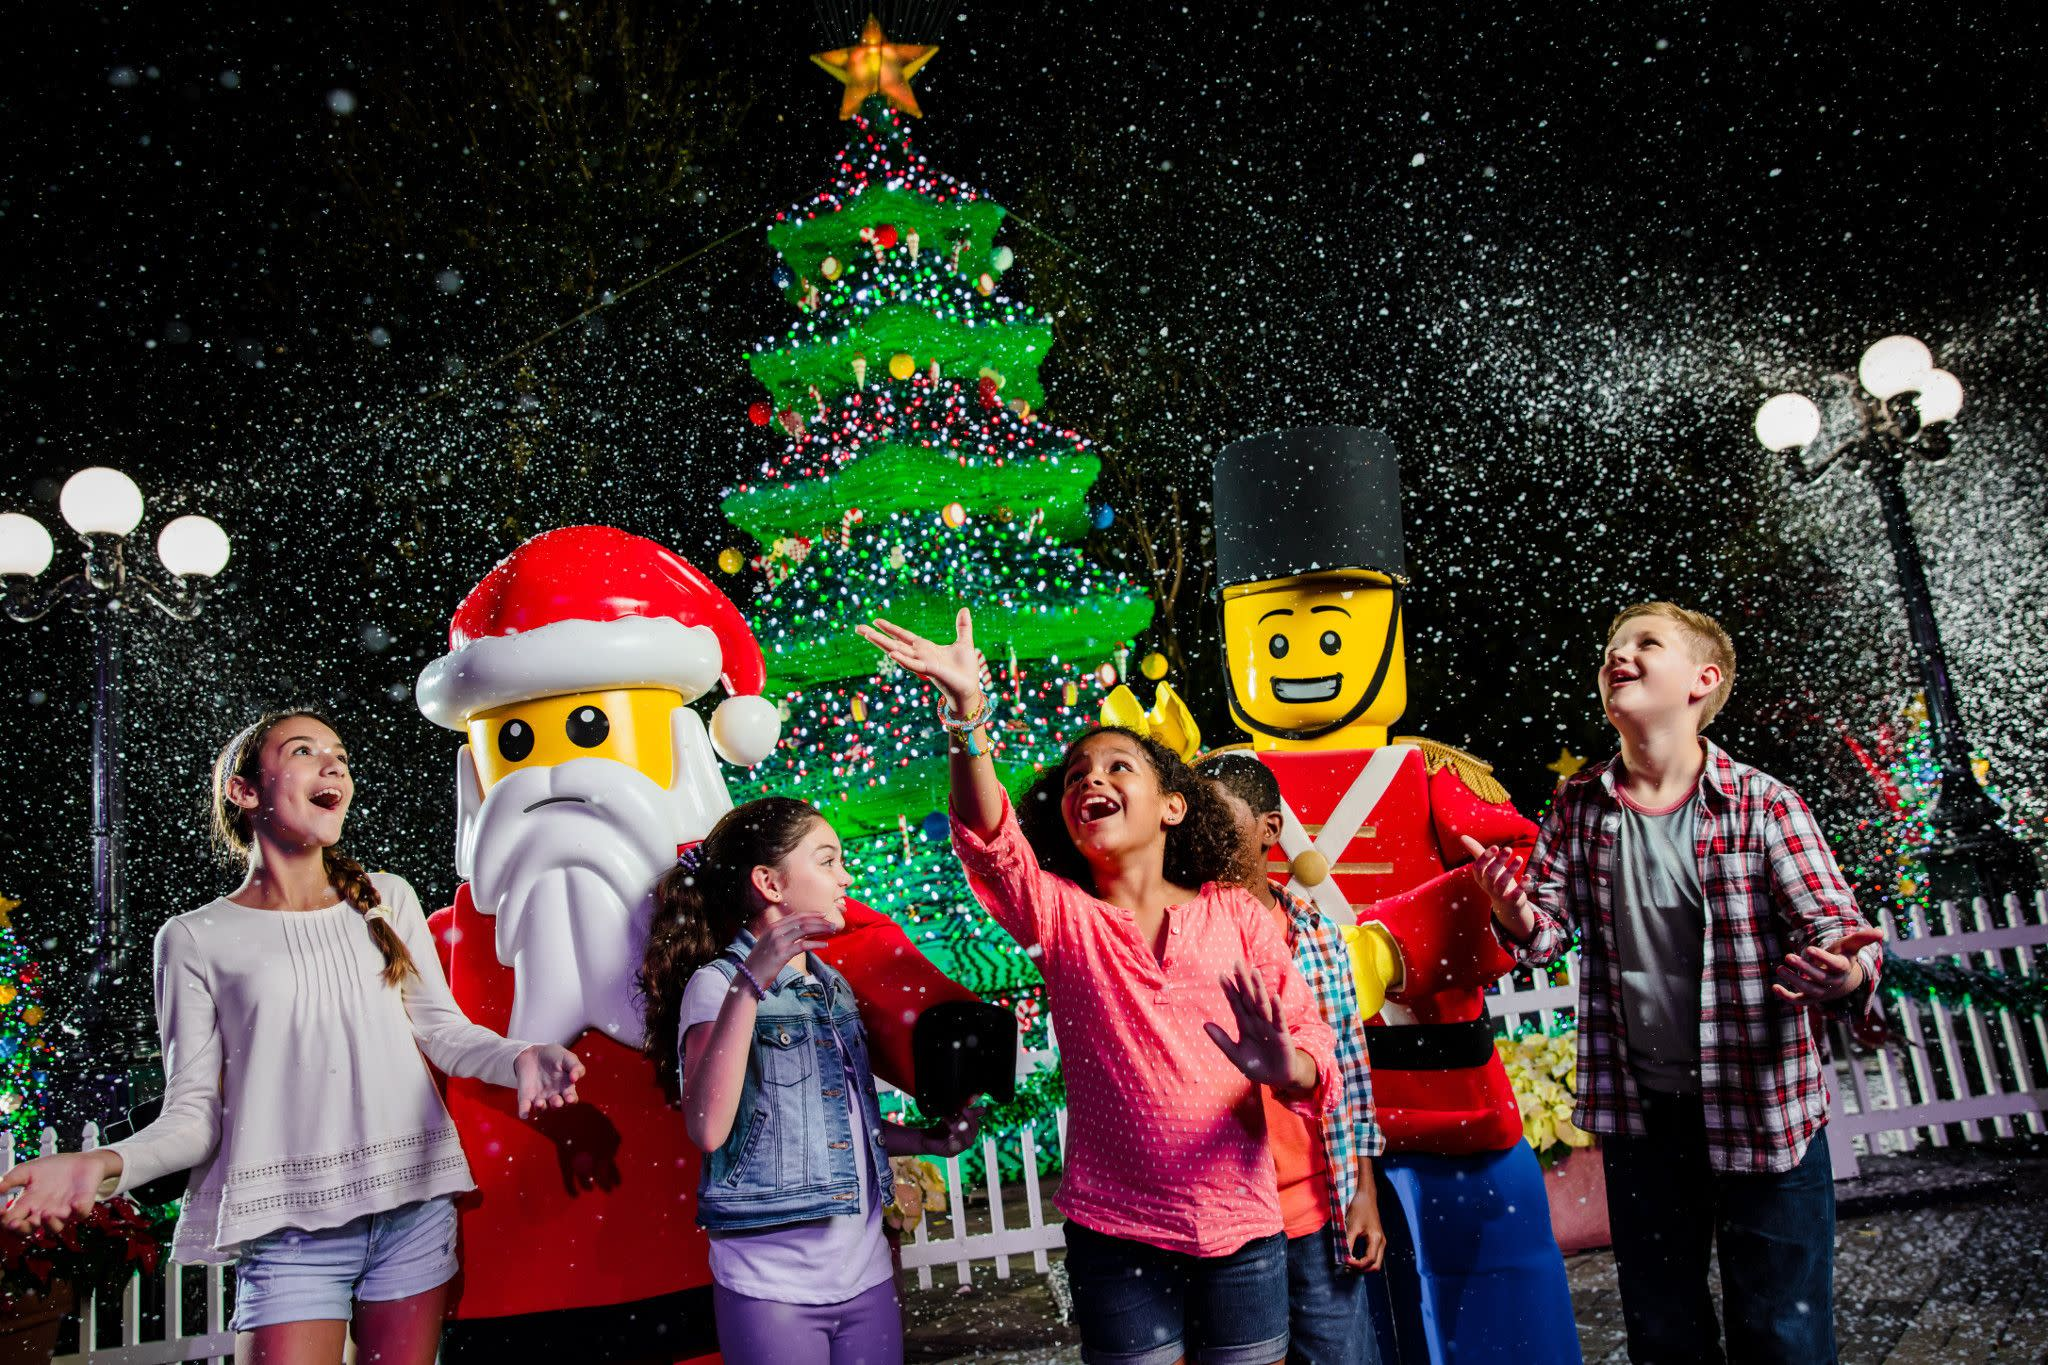 Meet LEGO Santa and LEGO Toy Solider During Holidays at LEGOLAND Florida Resort Near Orlando